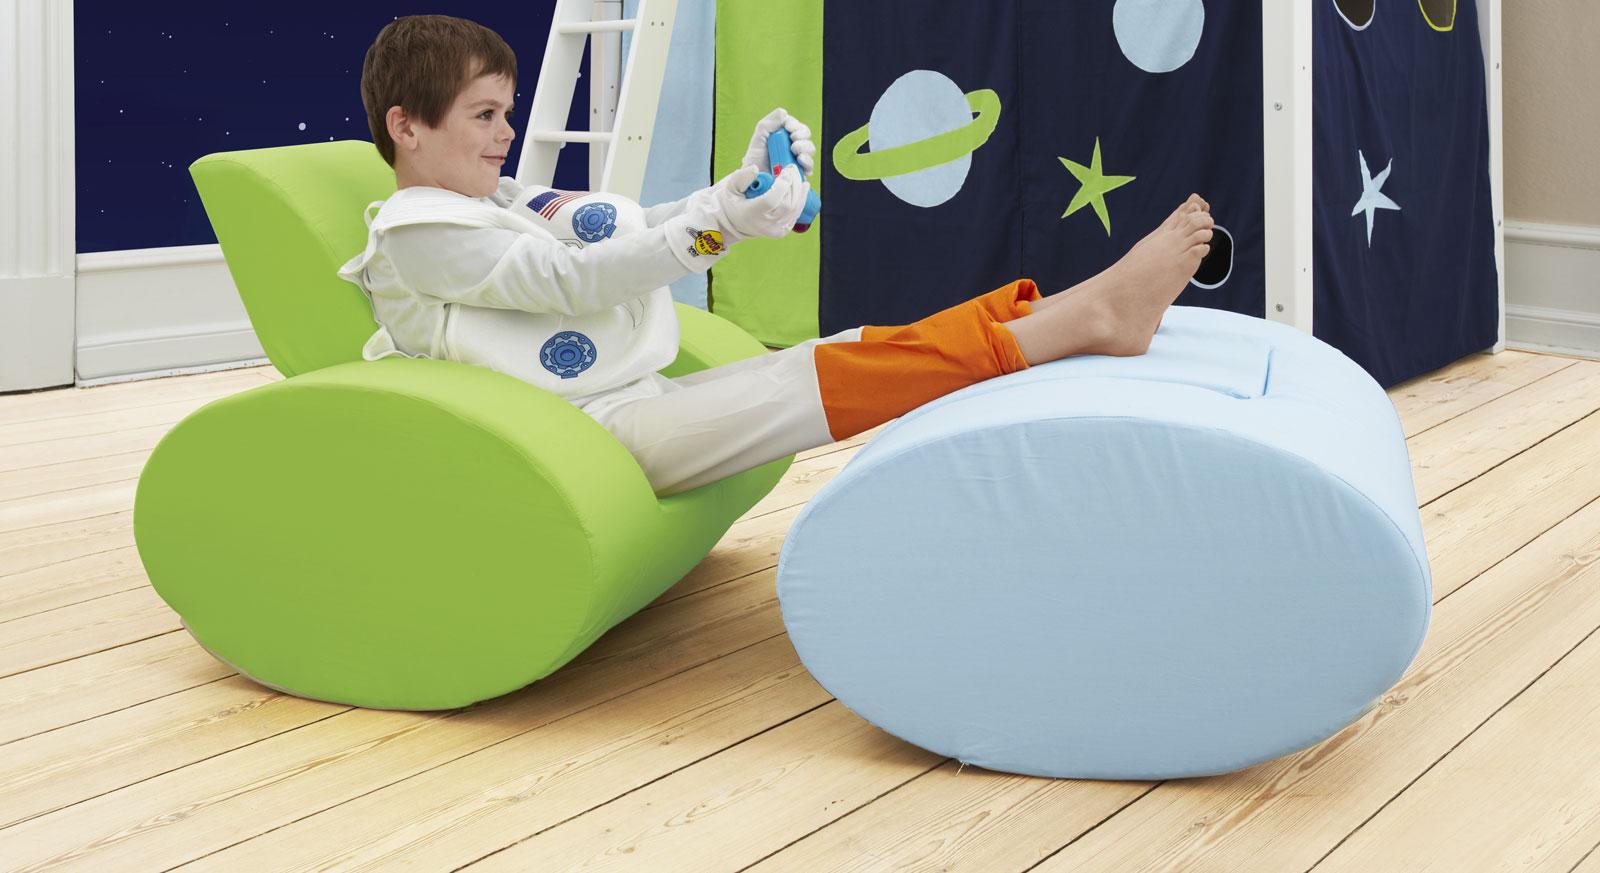 Moderner Kindersessel Kids Heaven zum Spielen